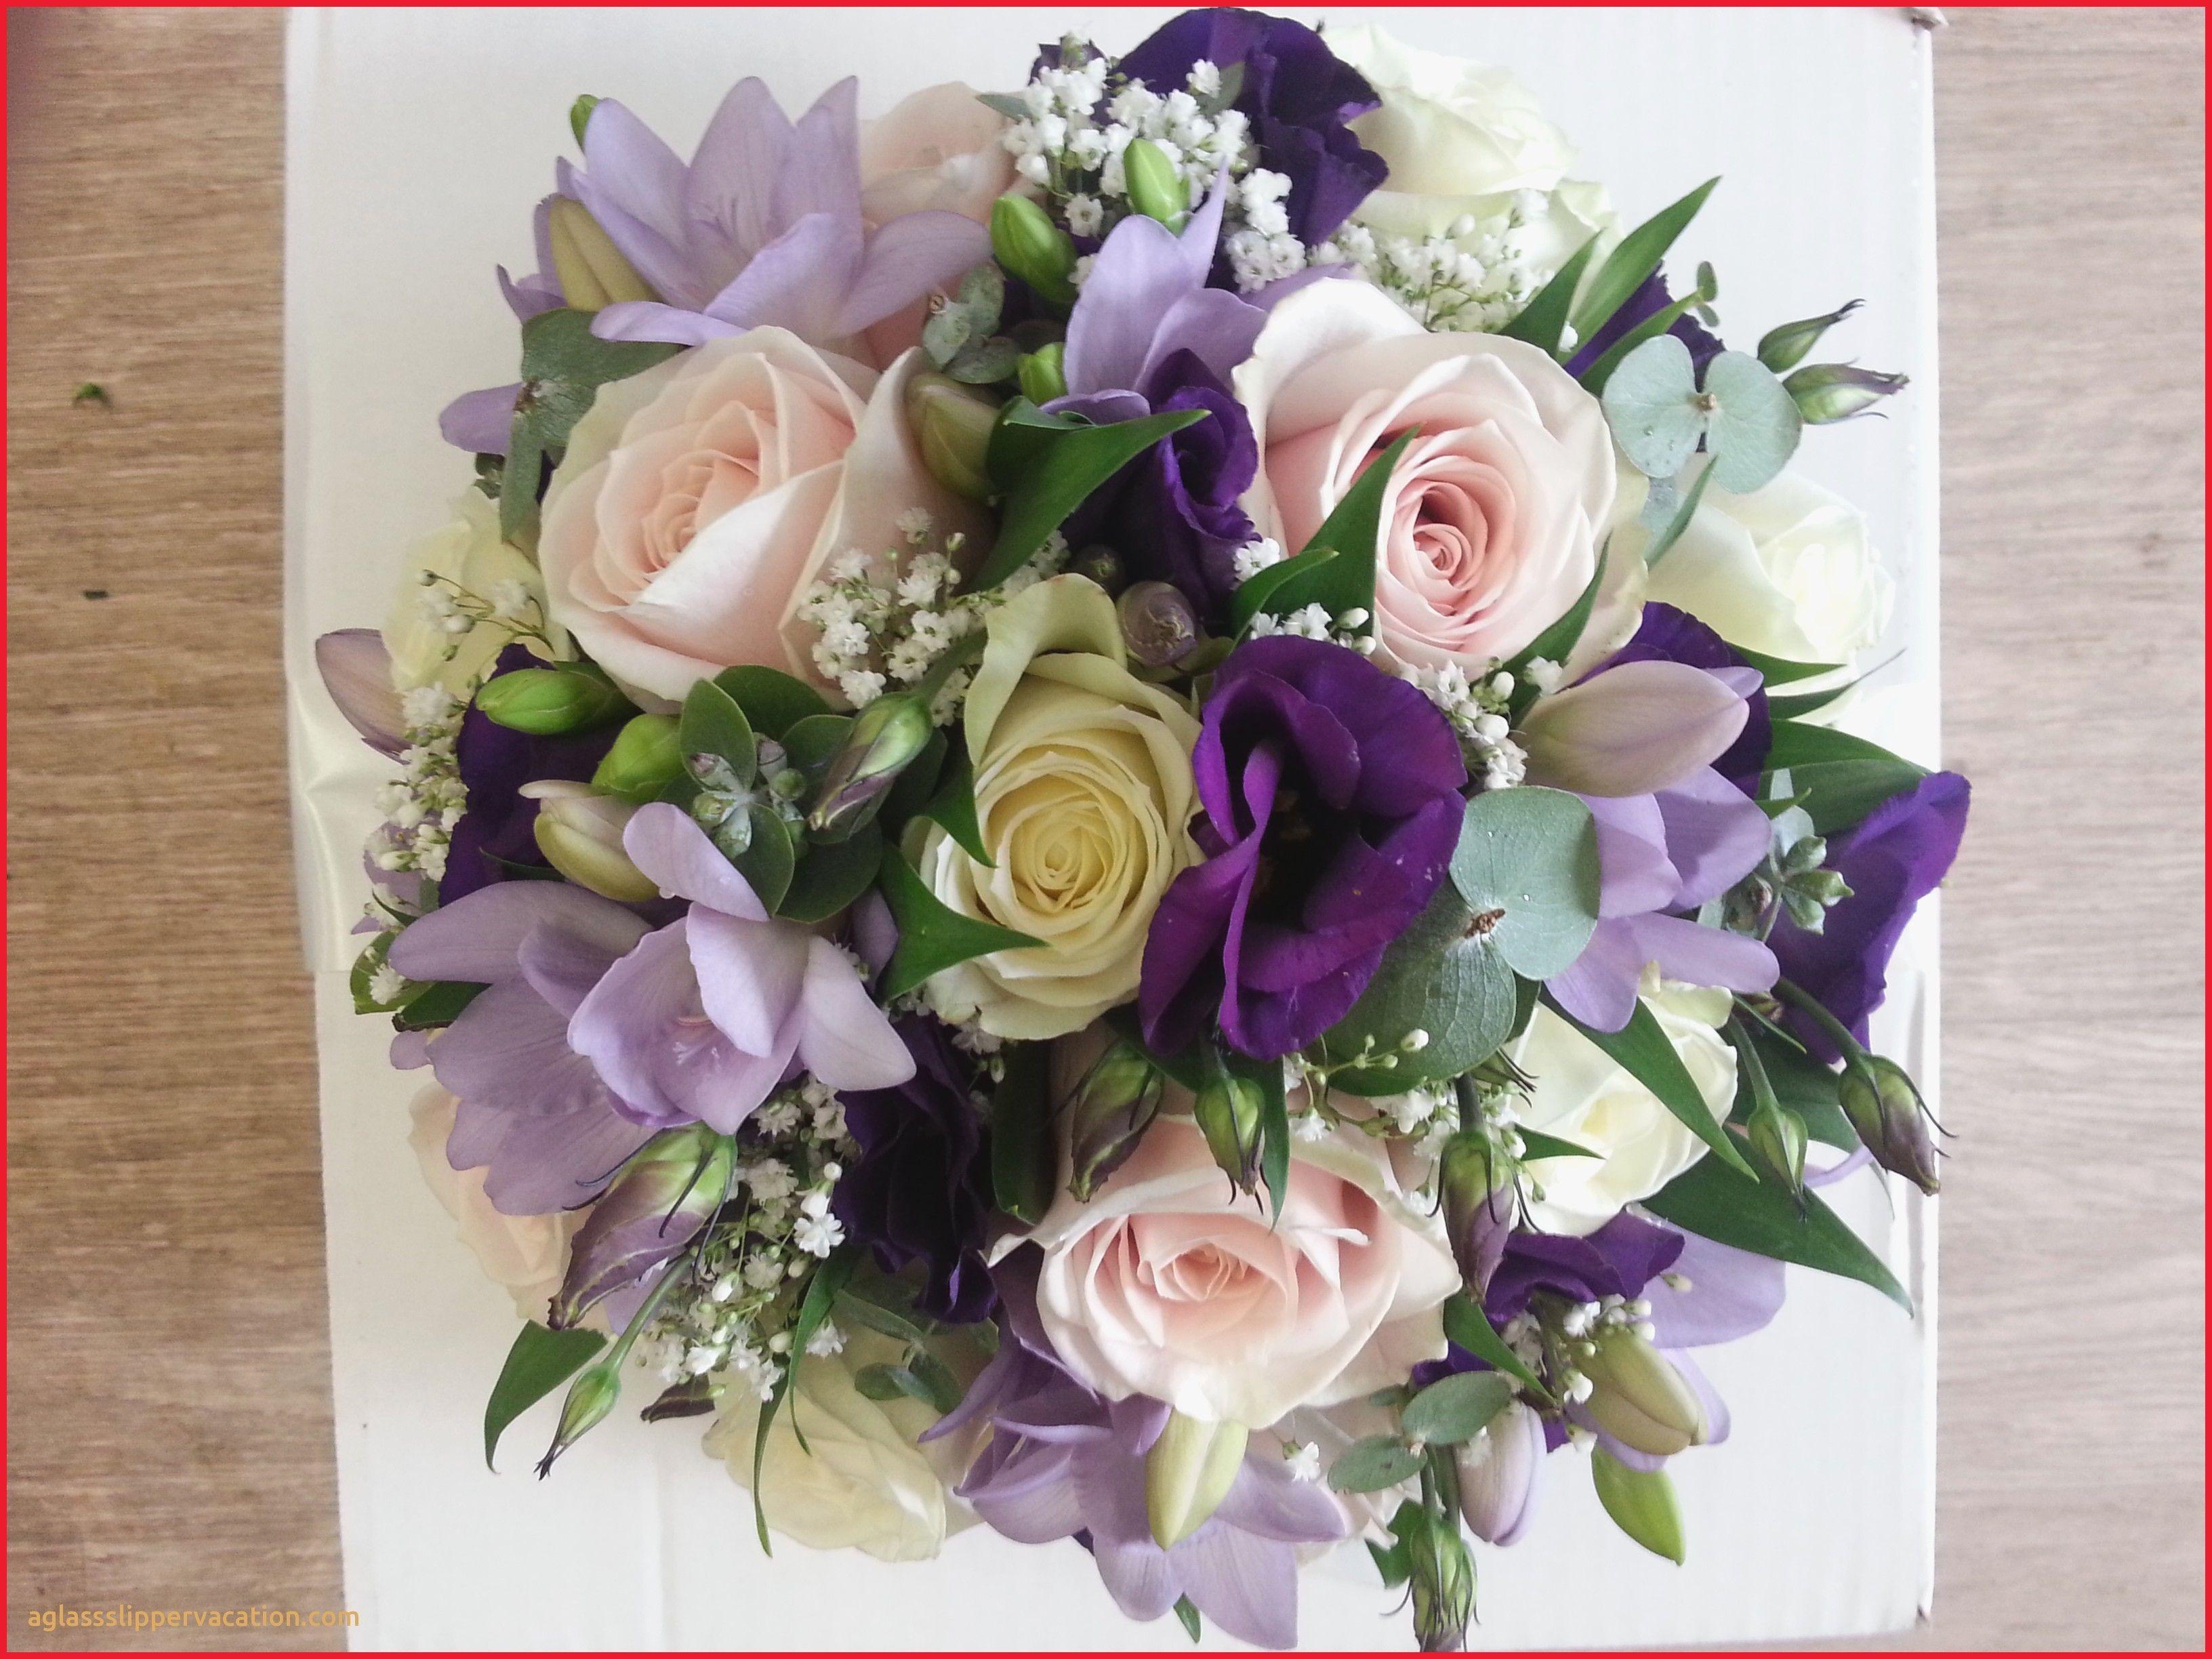 Beautiful Flowers 2019 » bouquet flowers photos | Beautiful Flowers